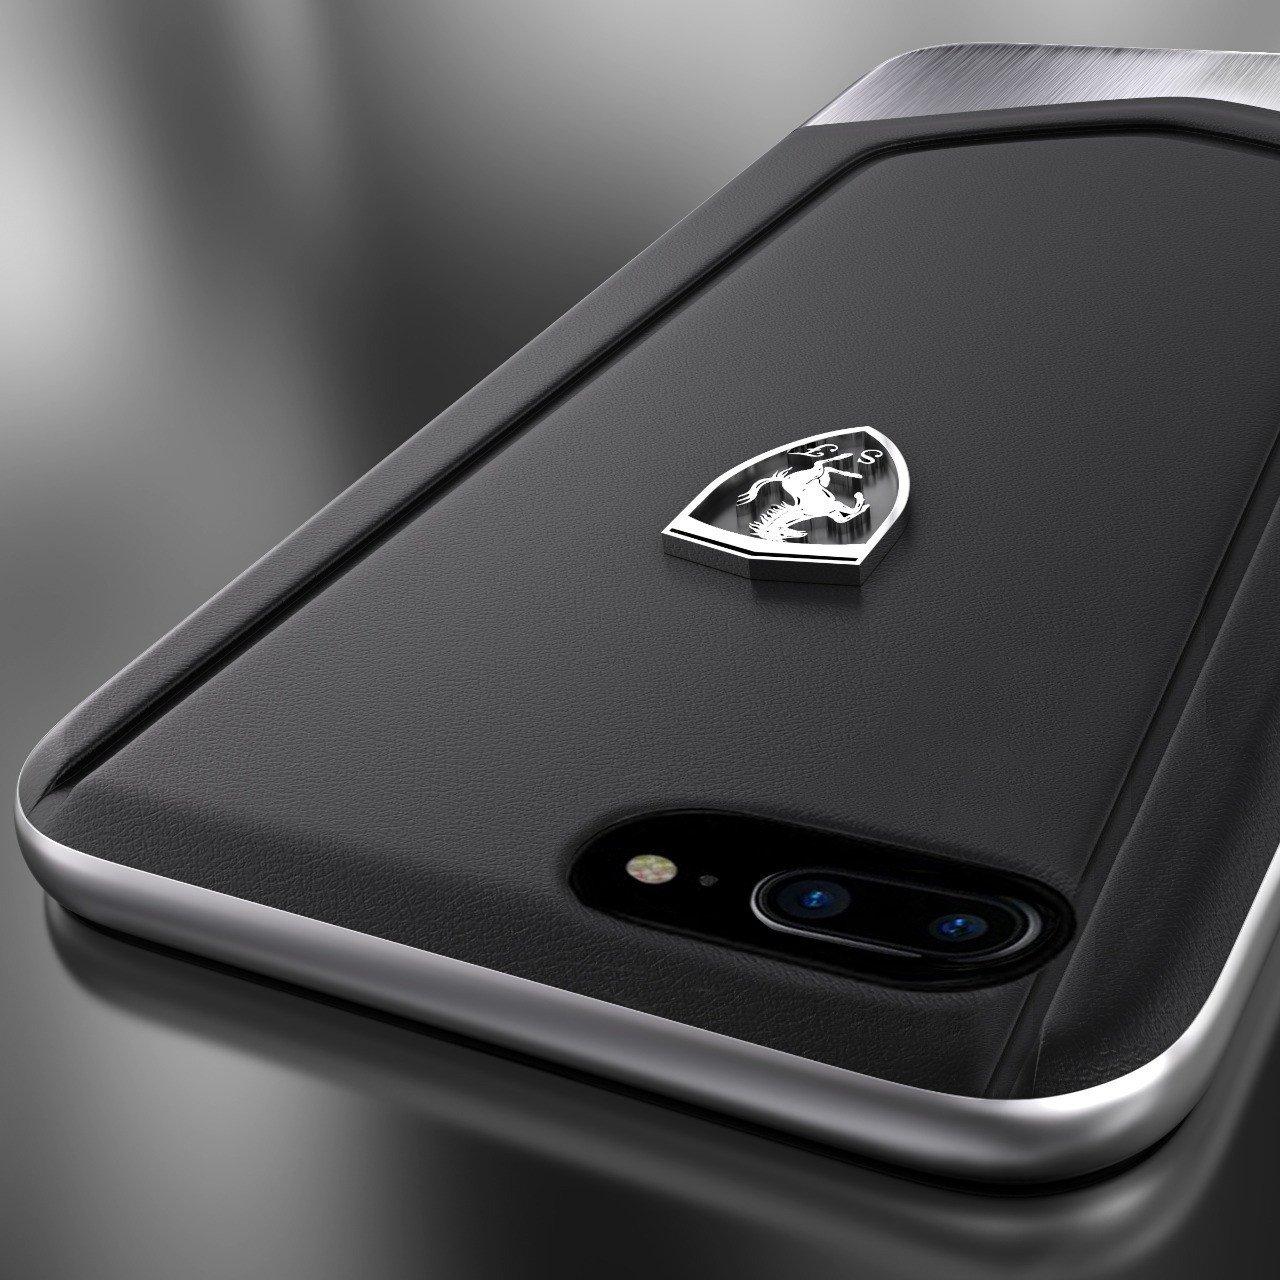 super popular f6dc0 5c723 Ferrari ® Apple iPhone 8 Plus Moranello Series Luxurious Leather + Metal  Case Limited Edition Back Cover